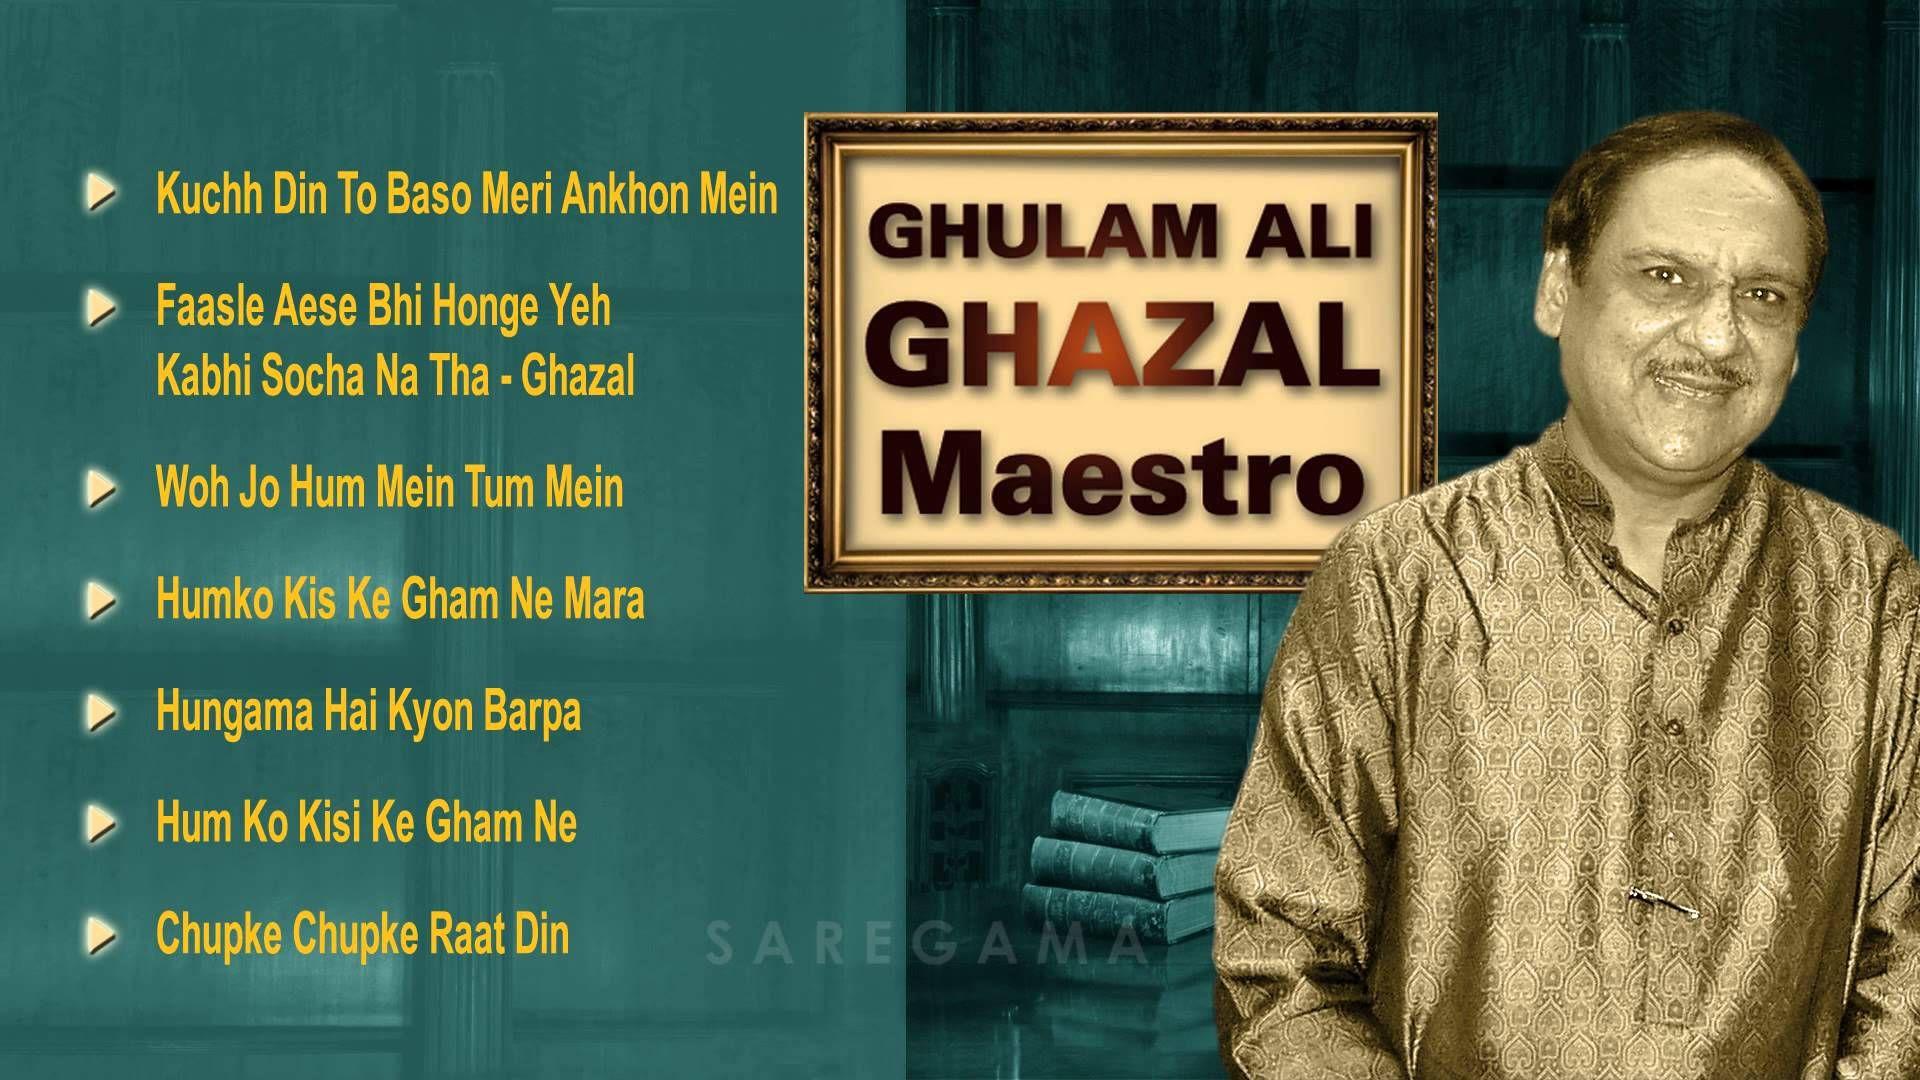 Ghulam ali audio ghazals free download